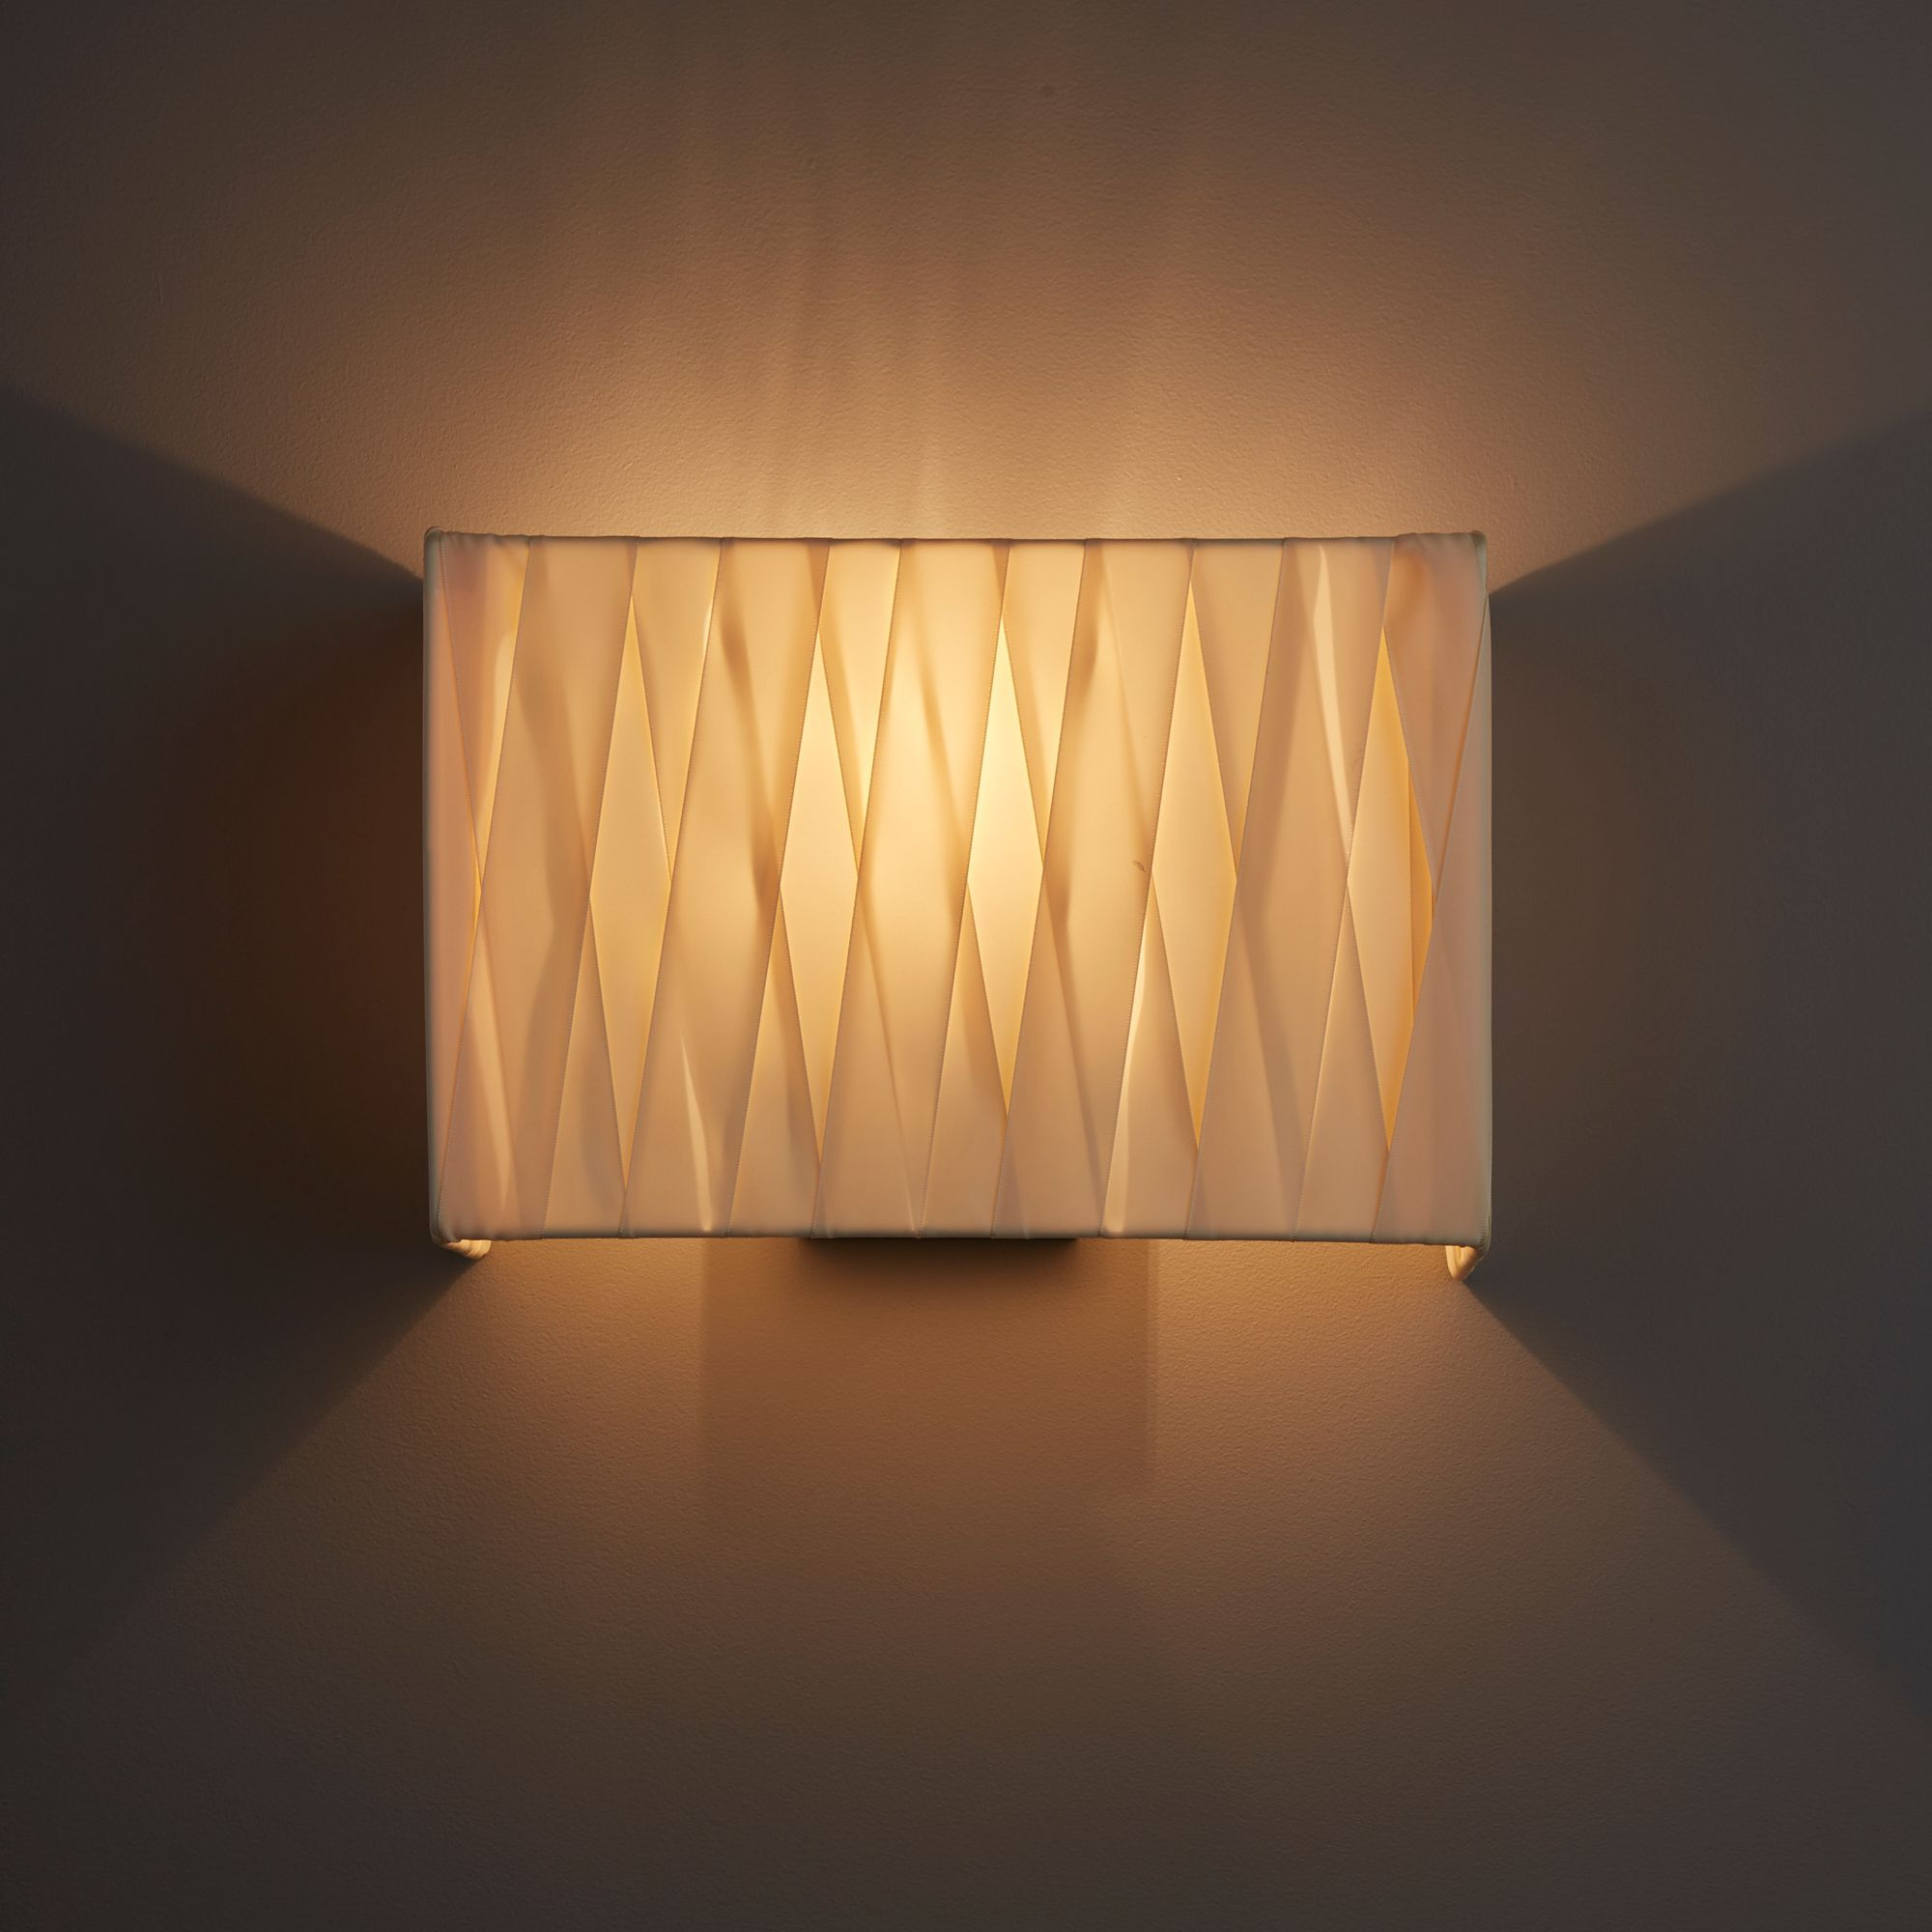 Acasia Ivory Ribbon & Matt Charcoal Paint Wall Light